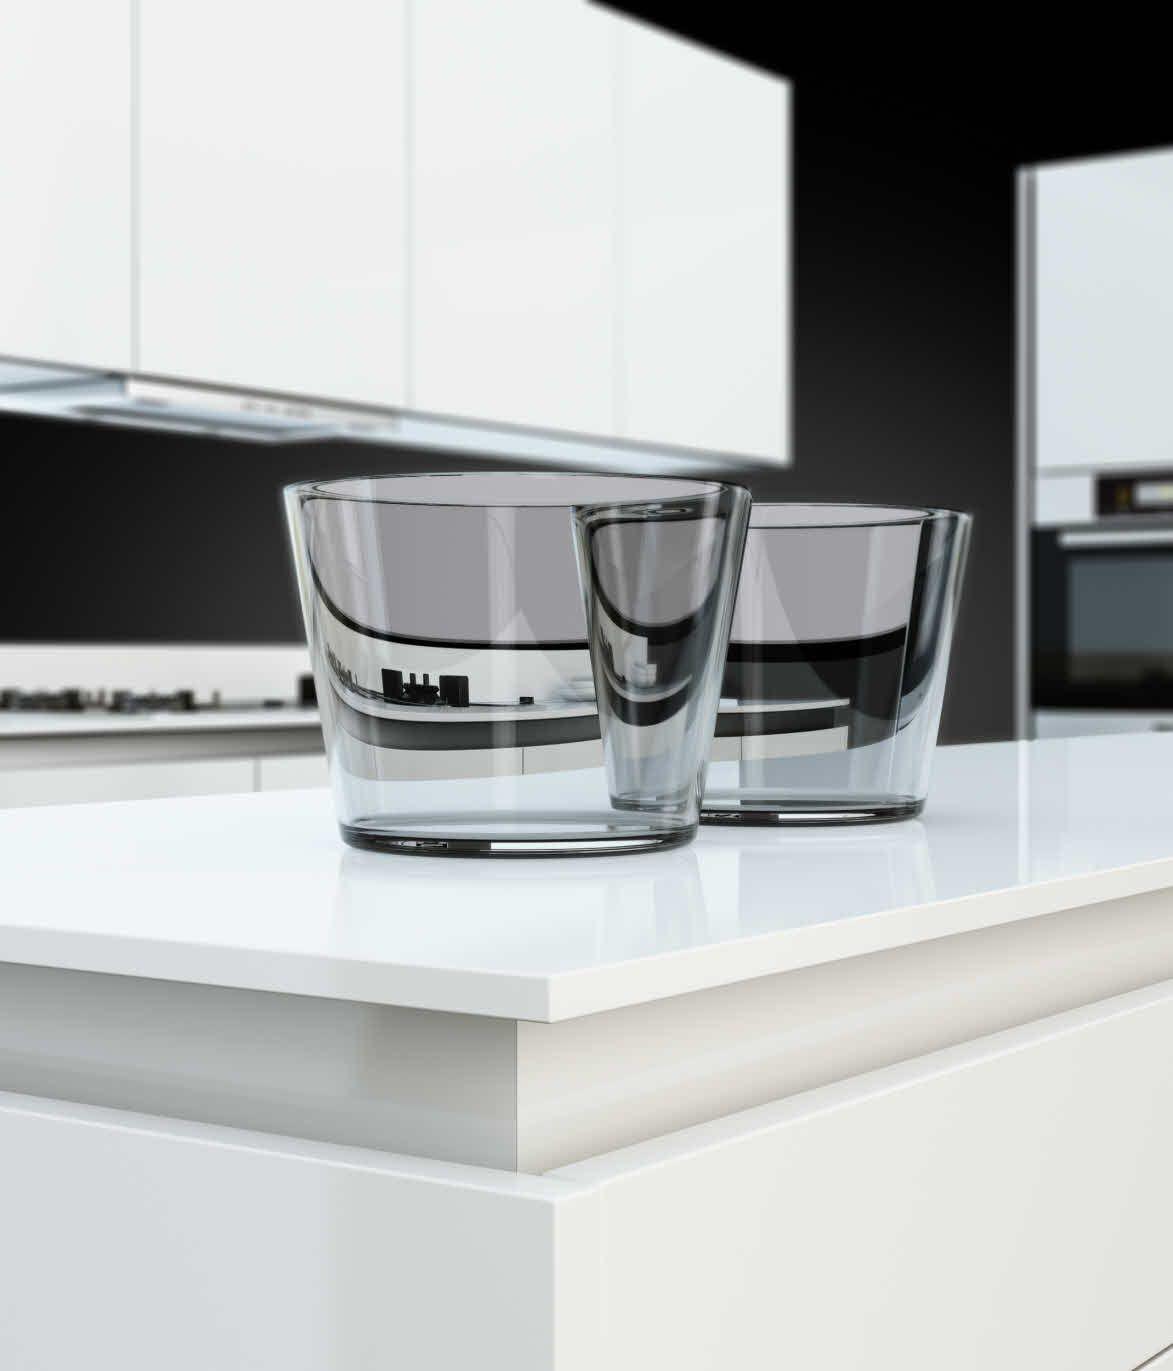 Kitchens From German Maker Poggenpohl: The Poggenpohl +SEGMENTO Polar White Worktop Is Just 12mm